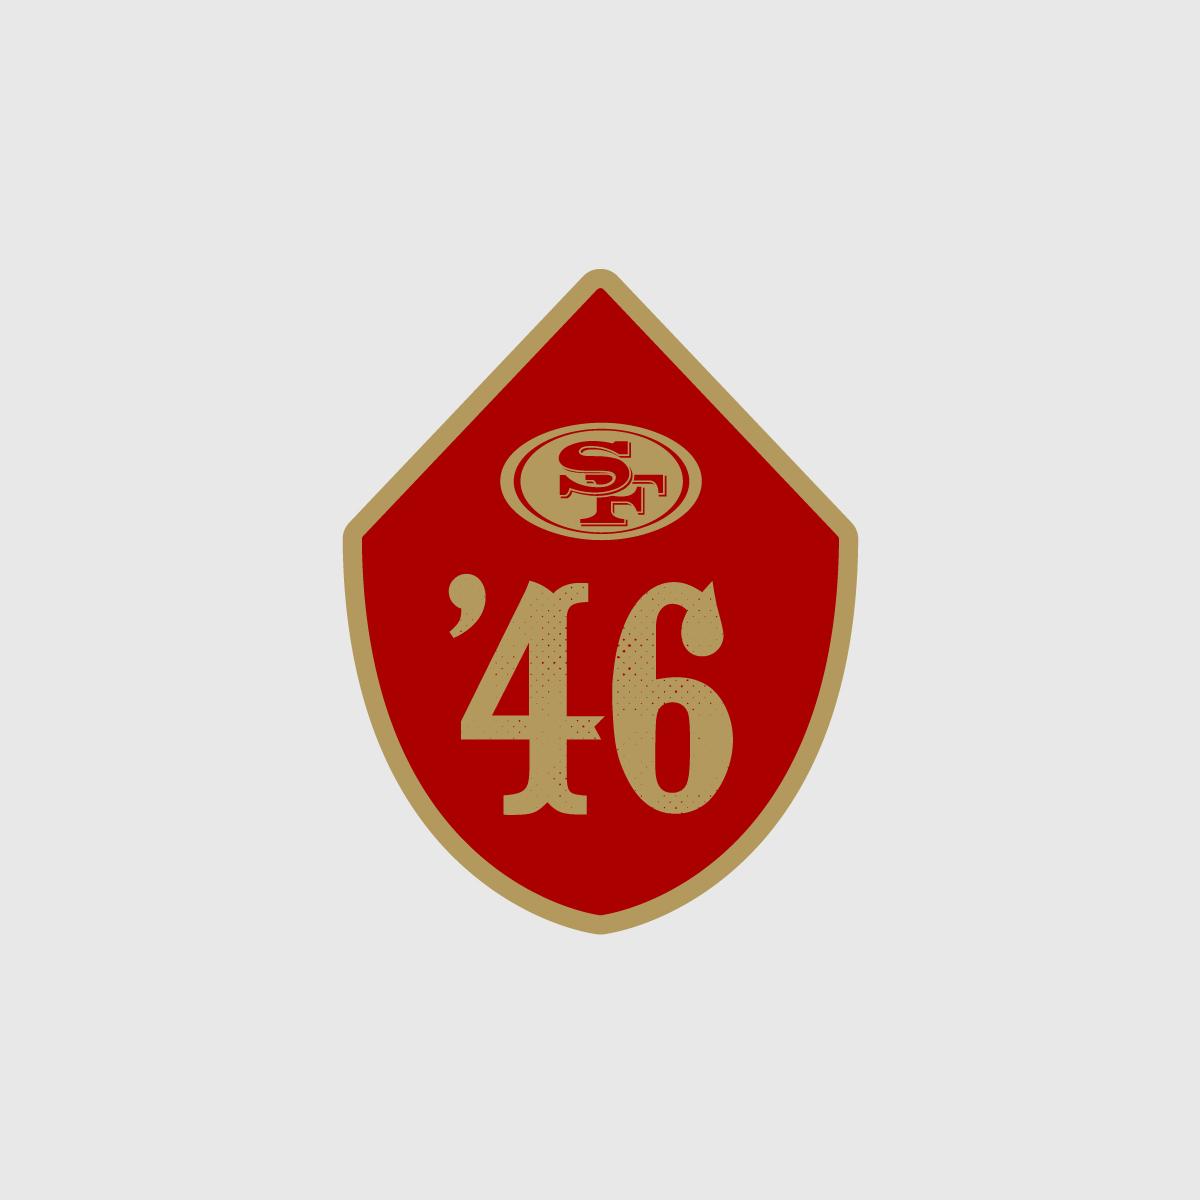 49LOGO-SINCE46.jpg